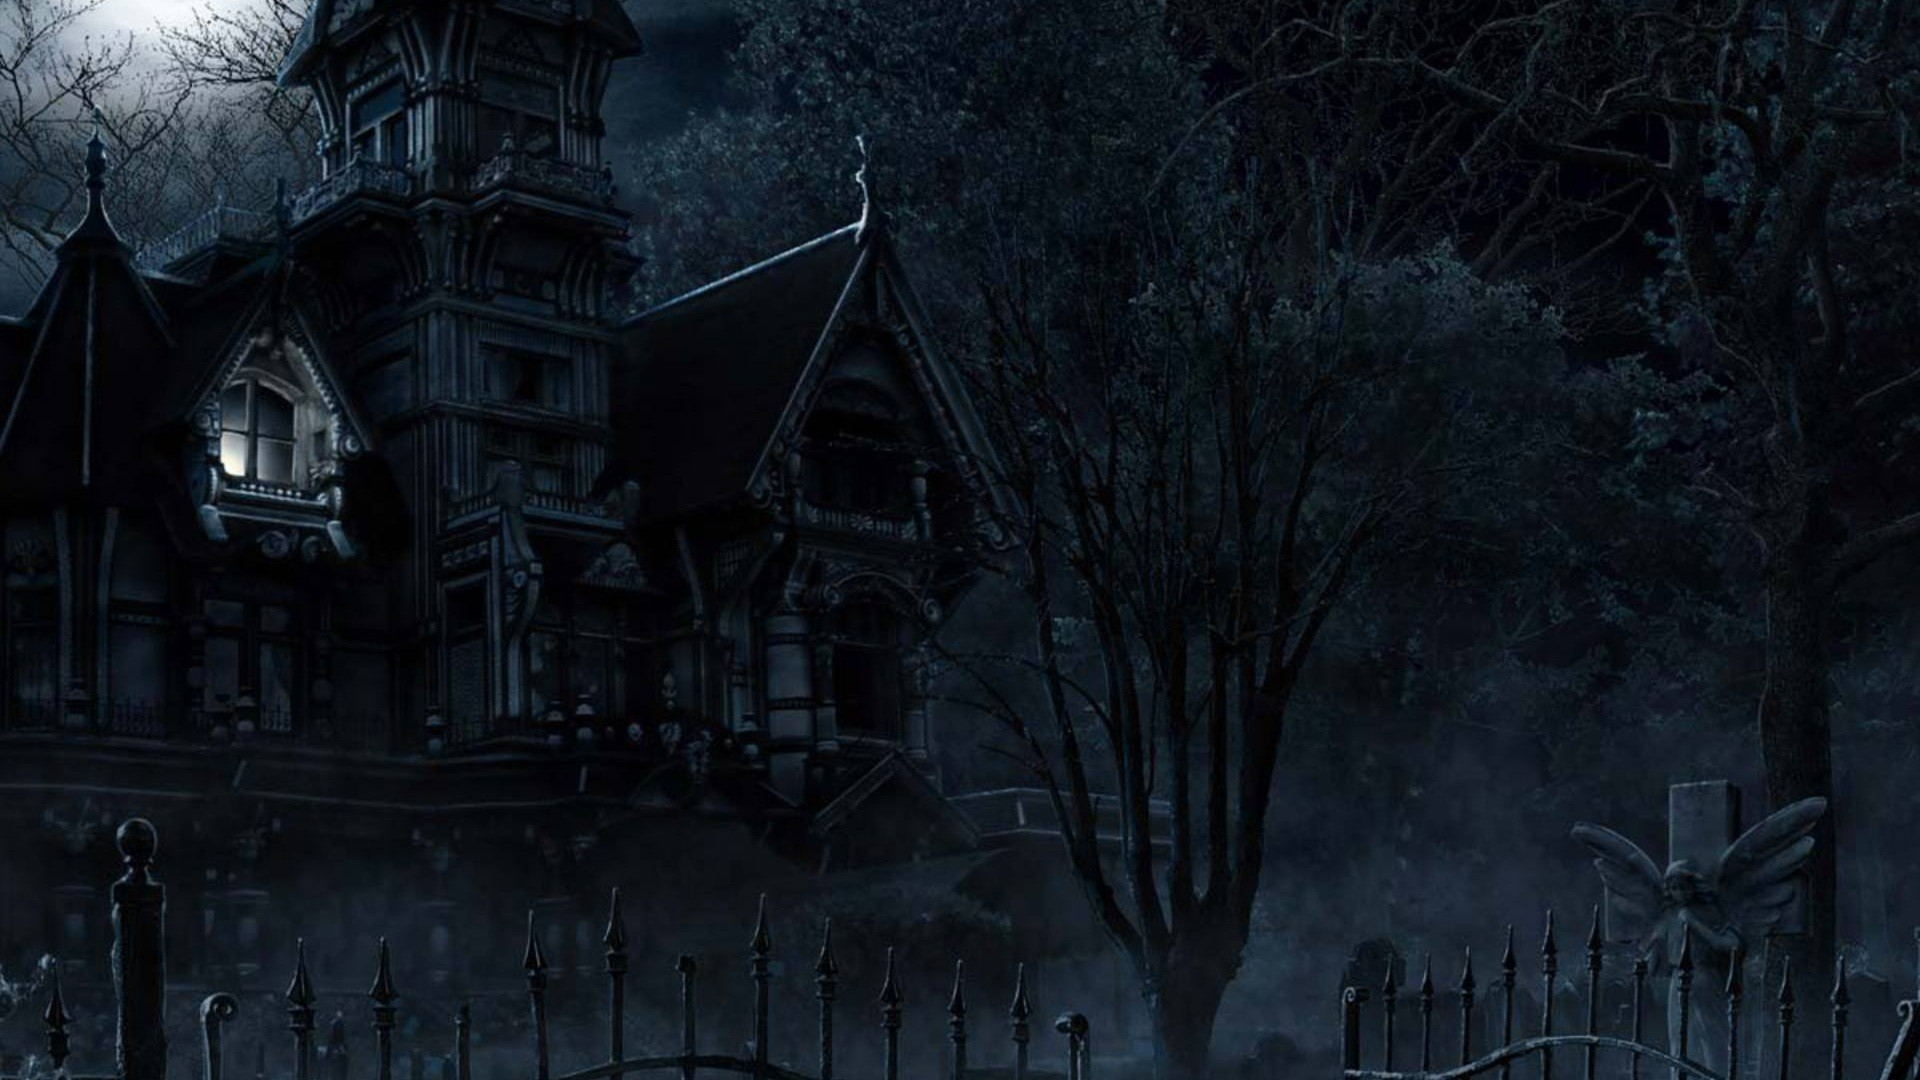 Free download halloween wallpaper HD.